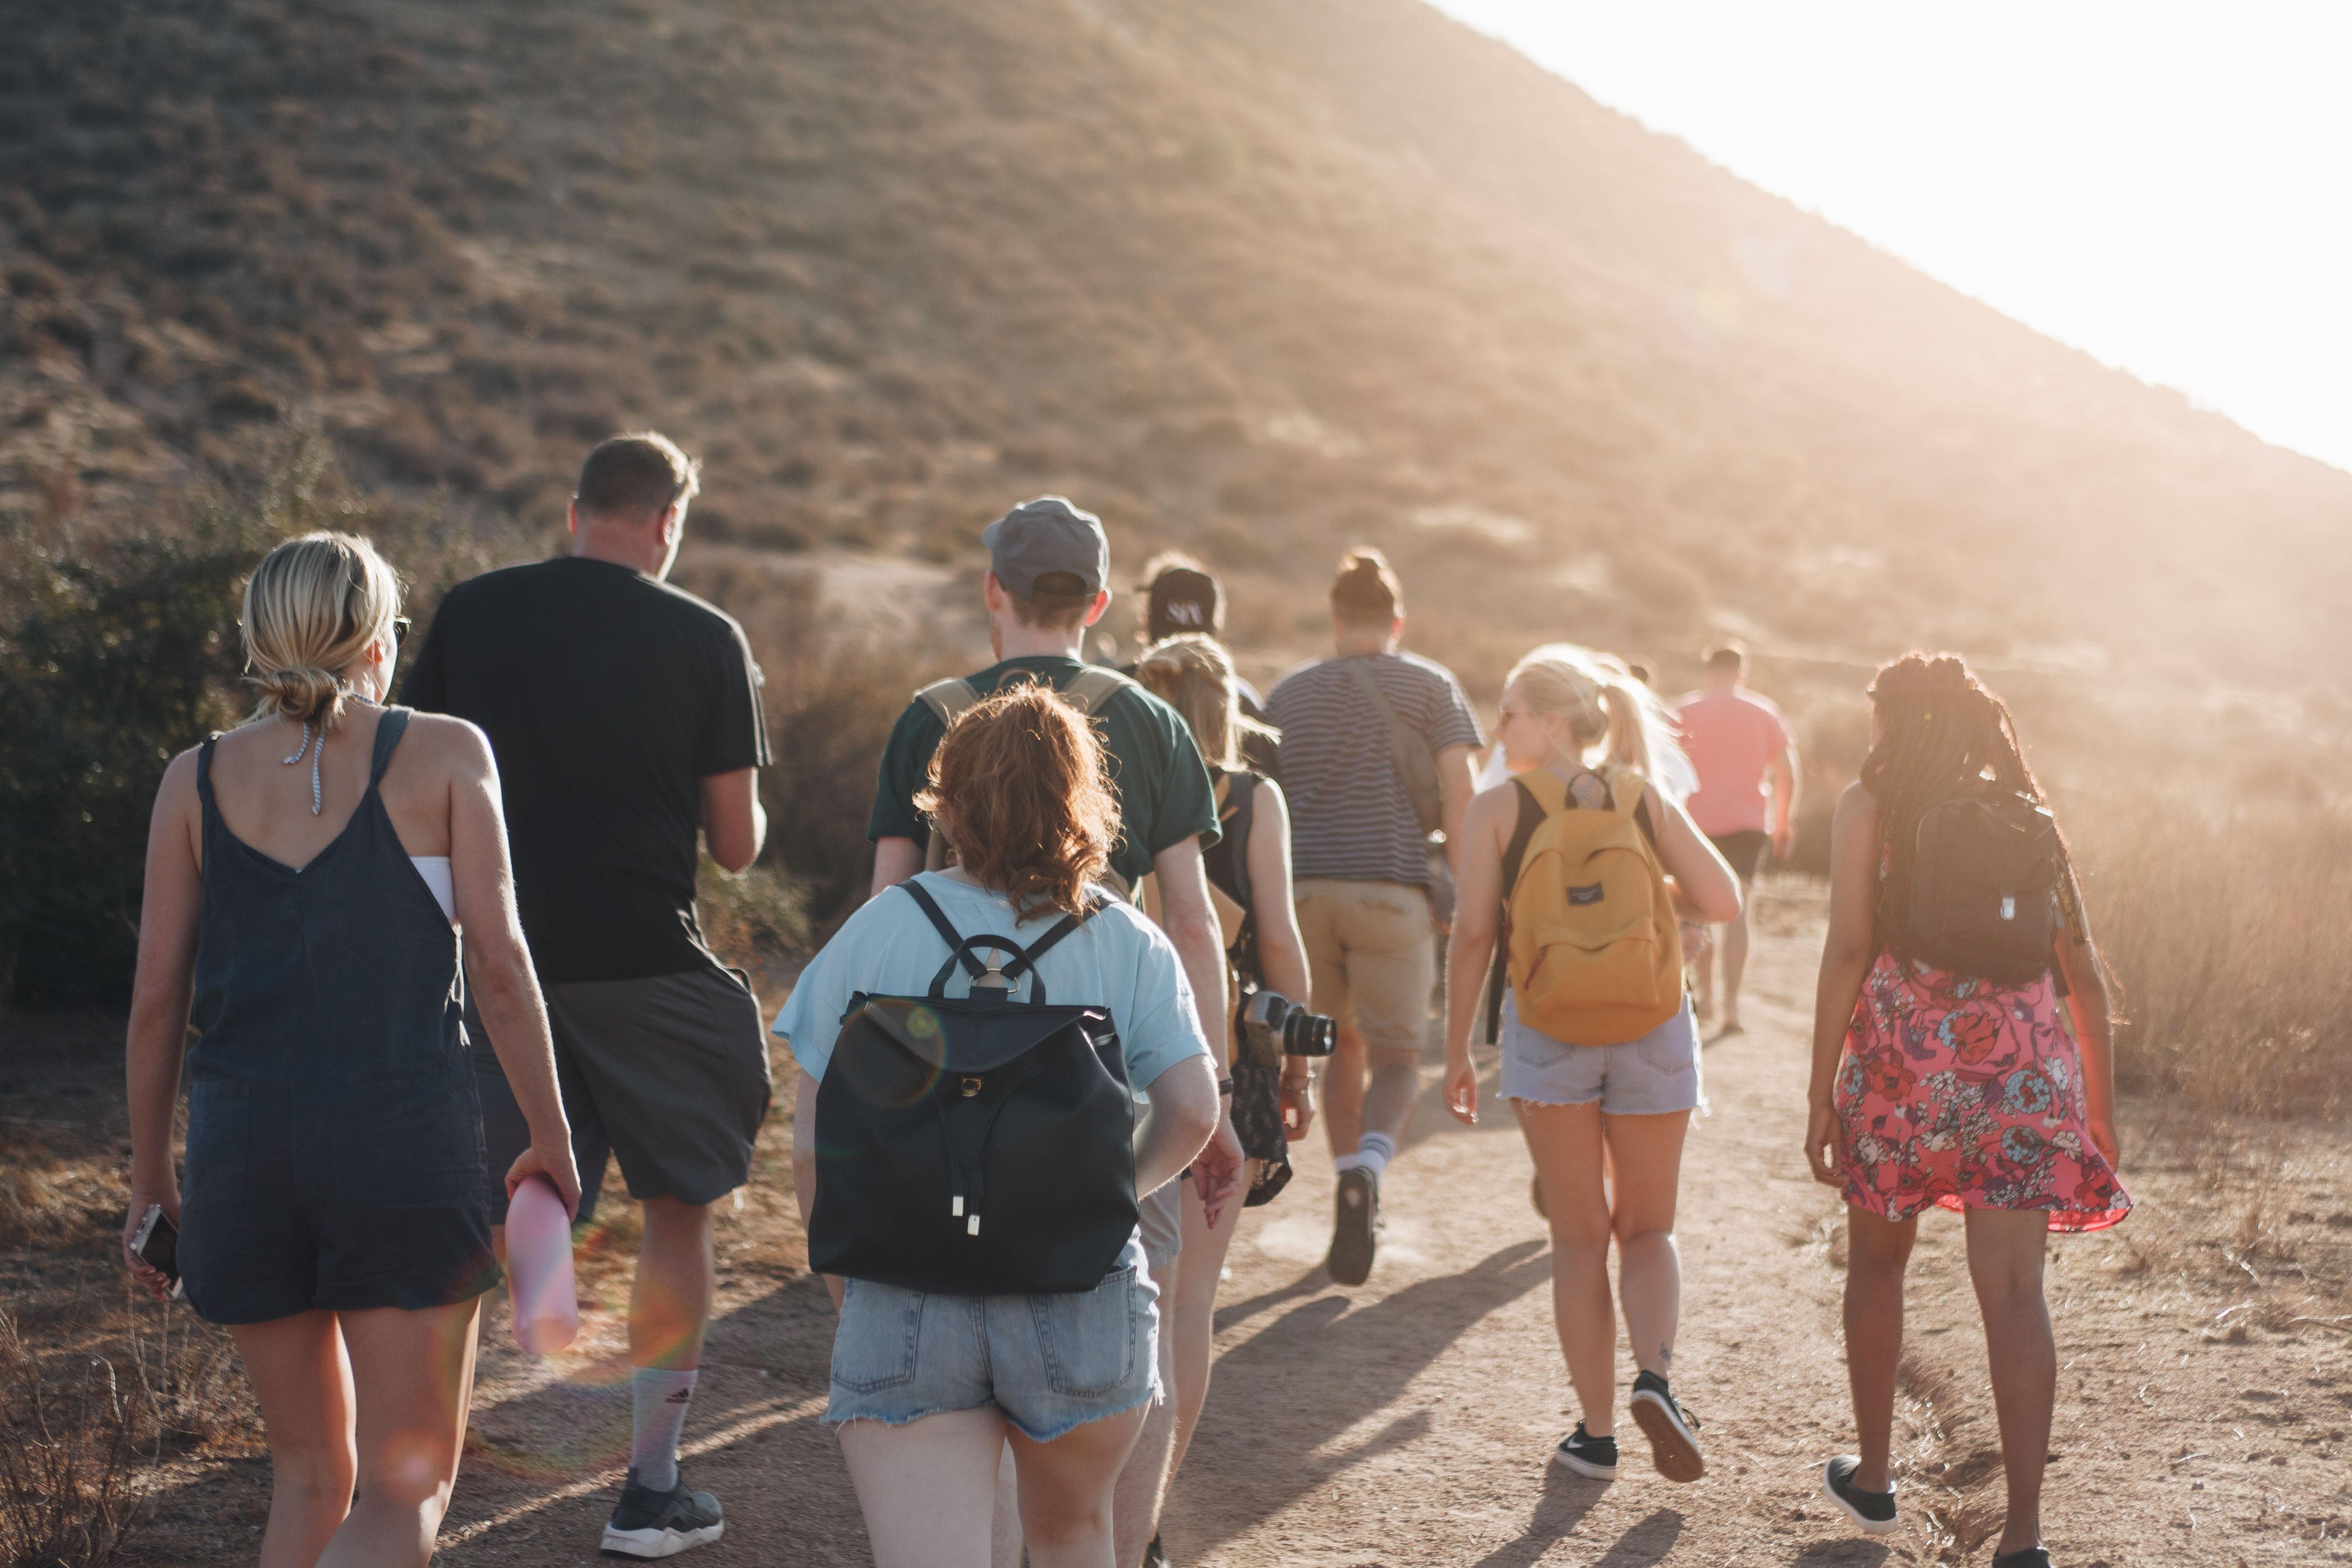 people walking on dirt road near mountain during daytime